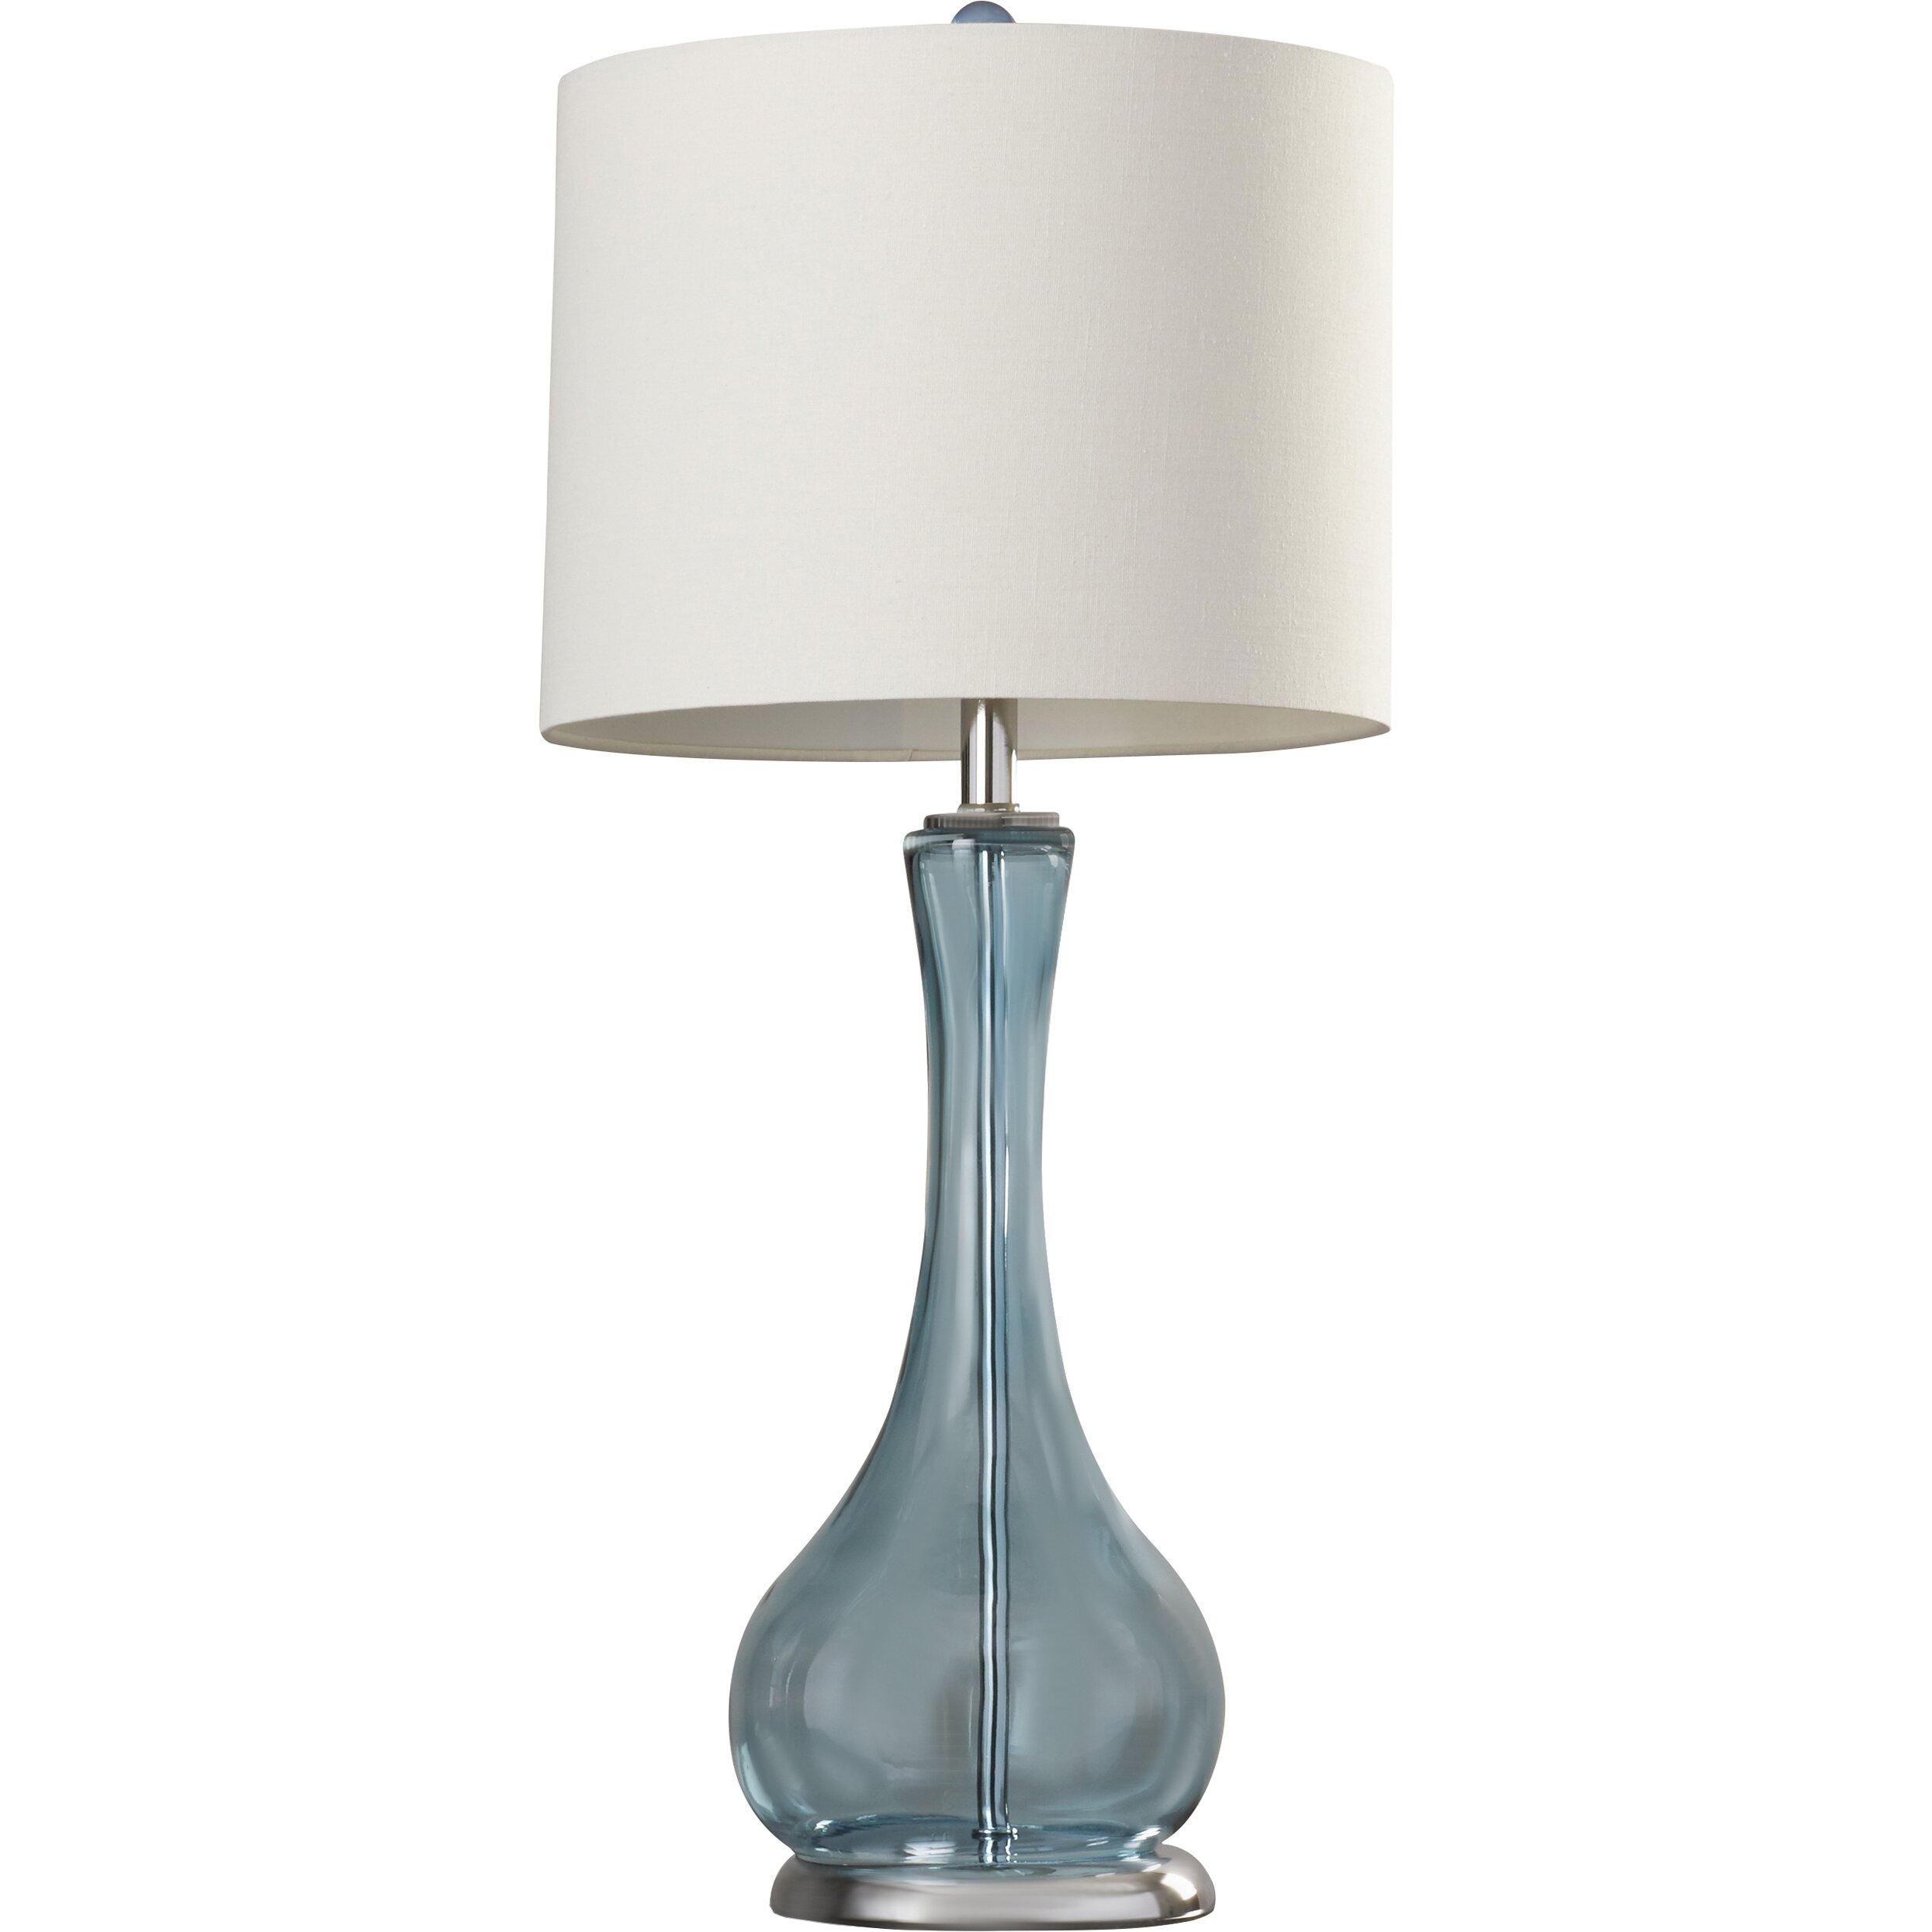 bahriya 25 5 h table lamp with rectangular shade reviews wa. Black Bedroom Furniture Sets. Home Design Ideas